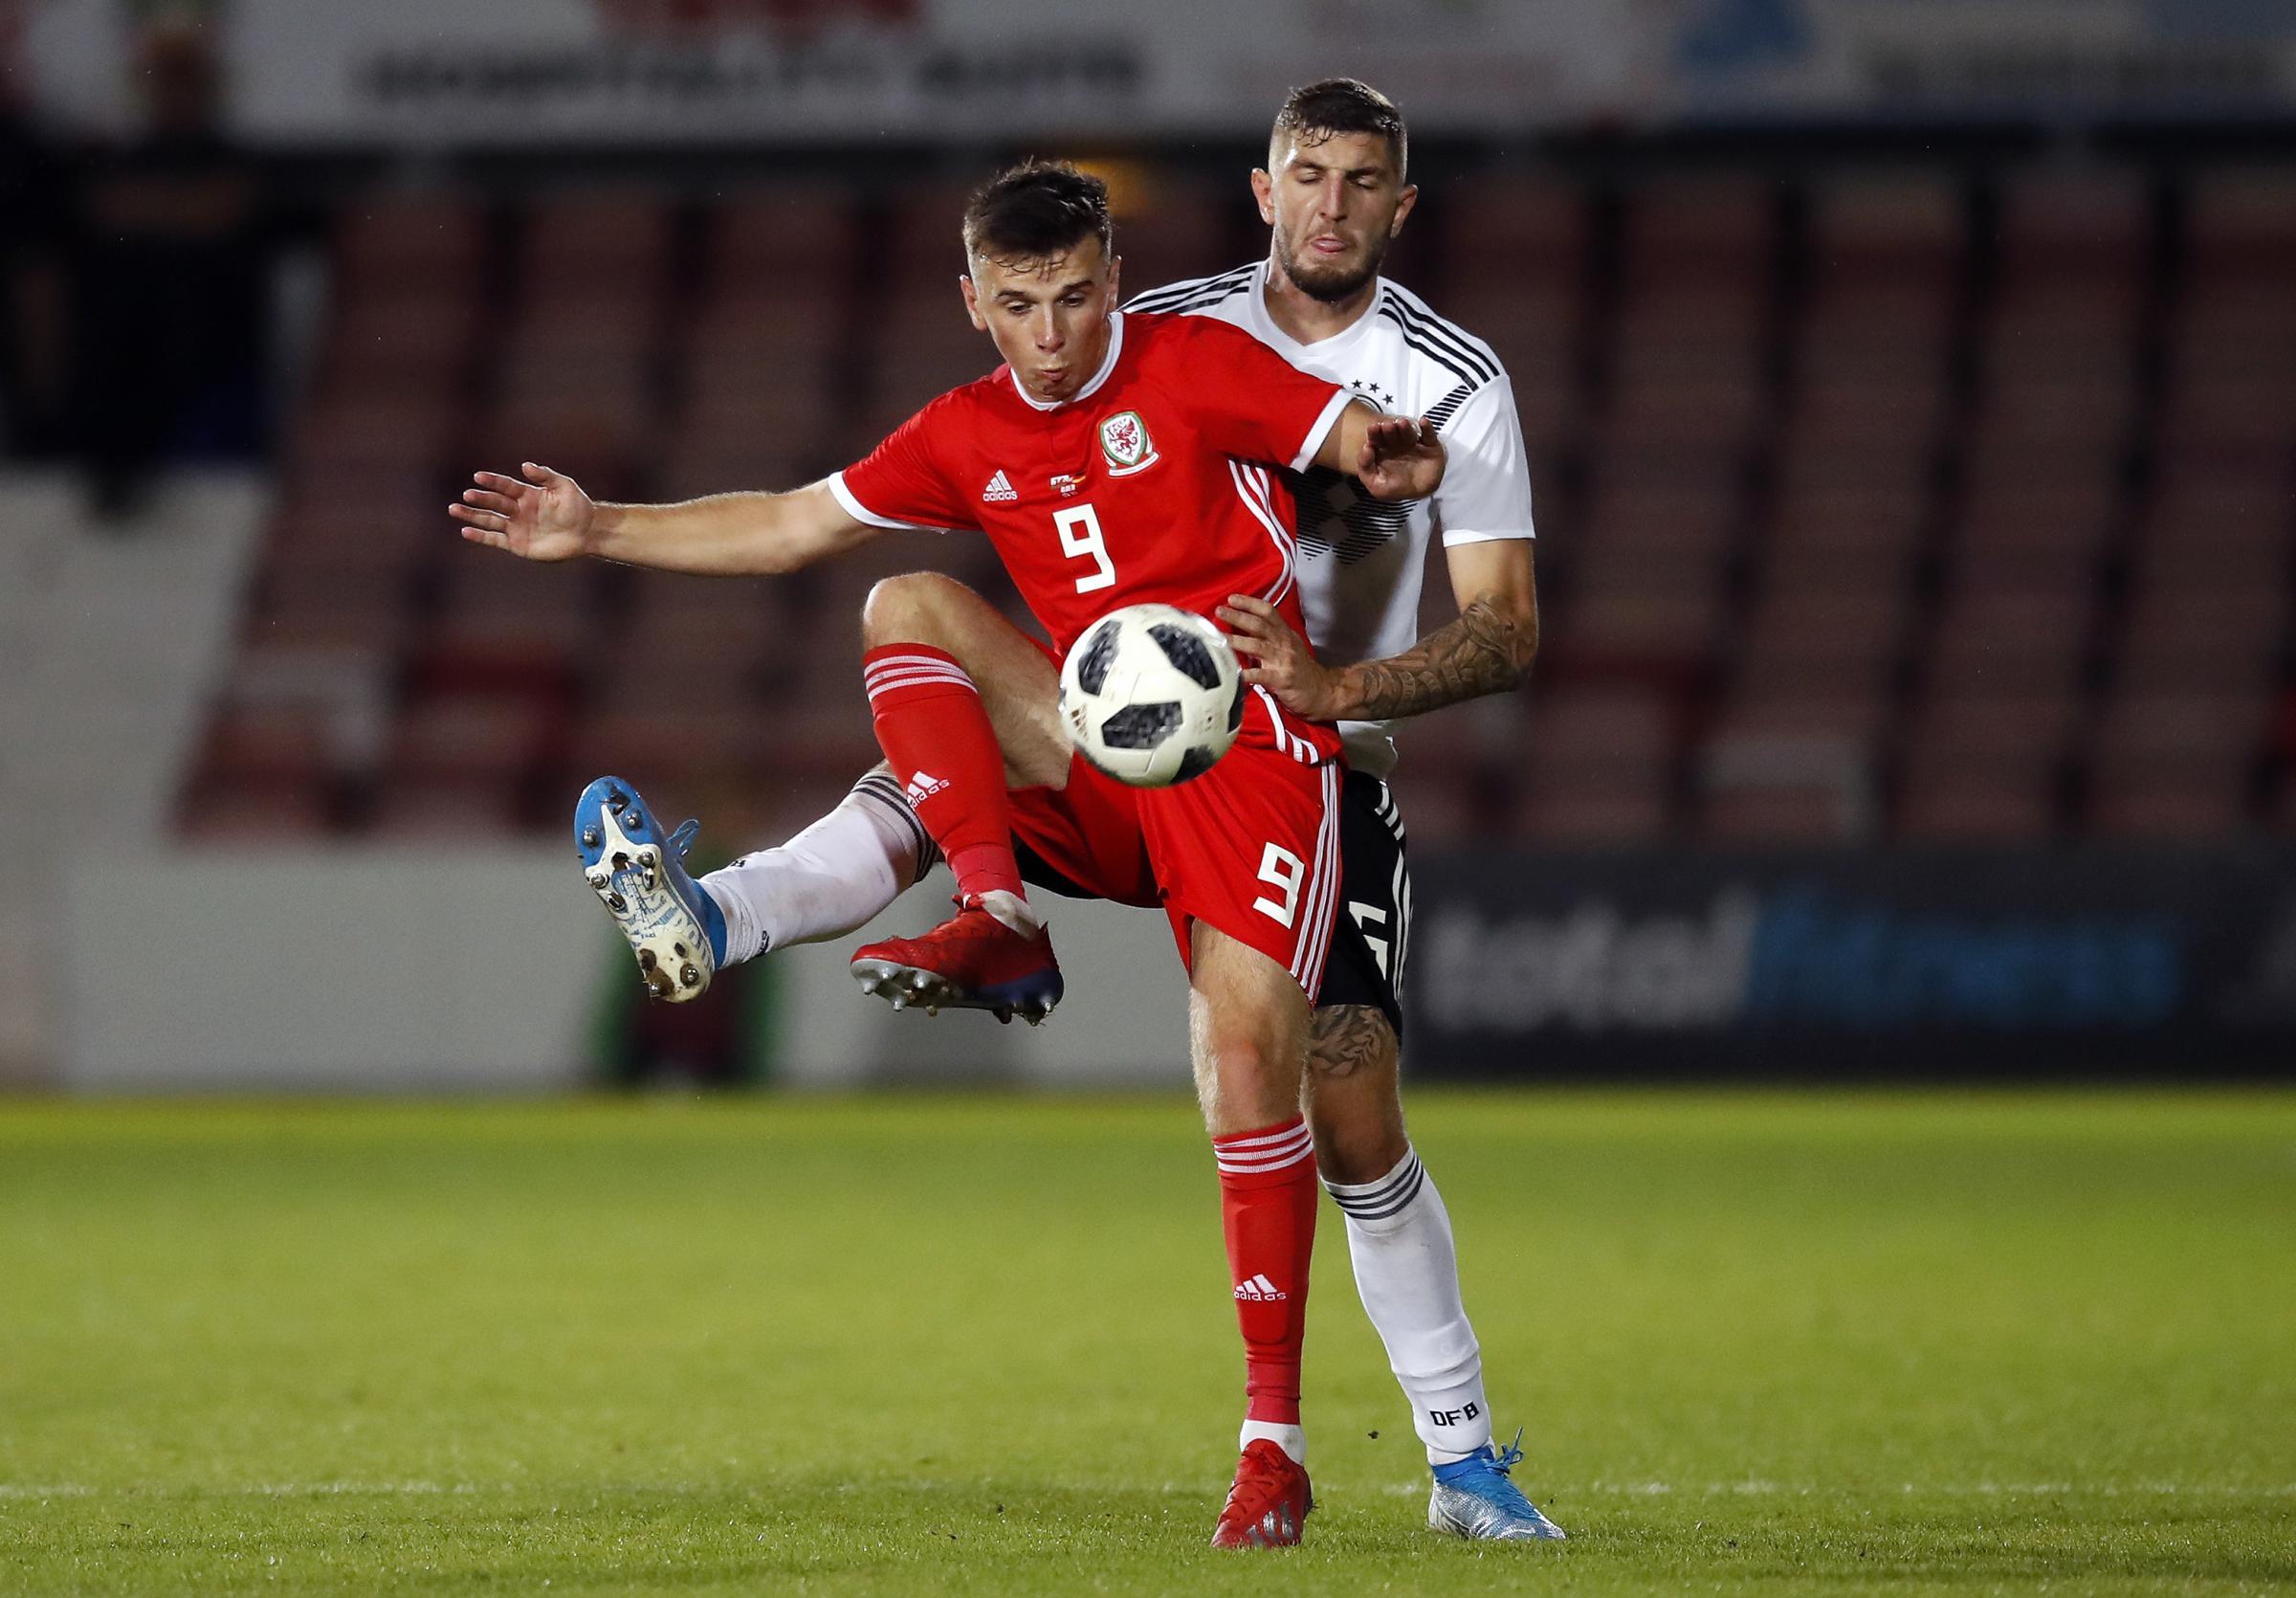 Striker Mark Harris is back as Wrexham AFC return to league action against Sutton